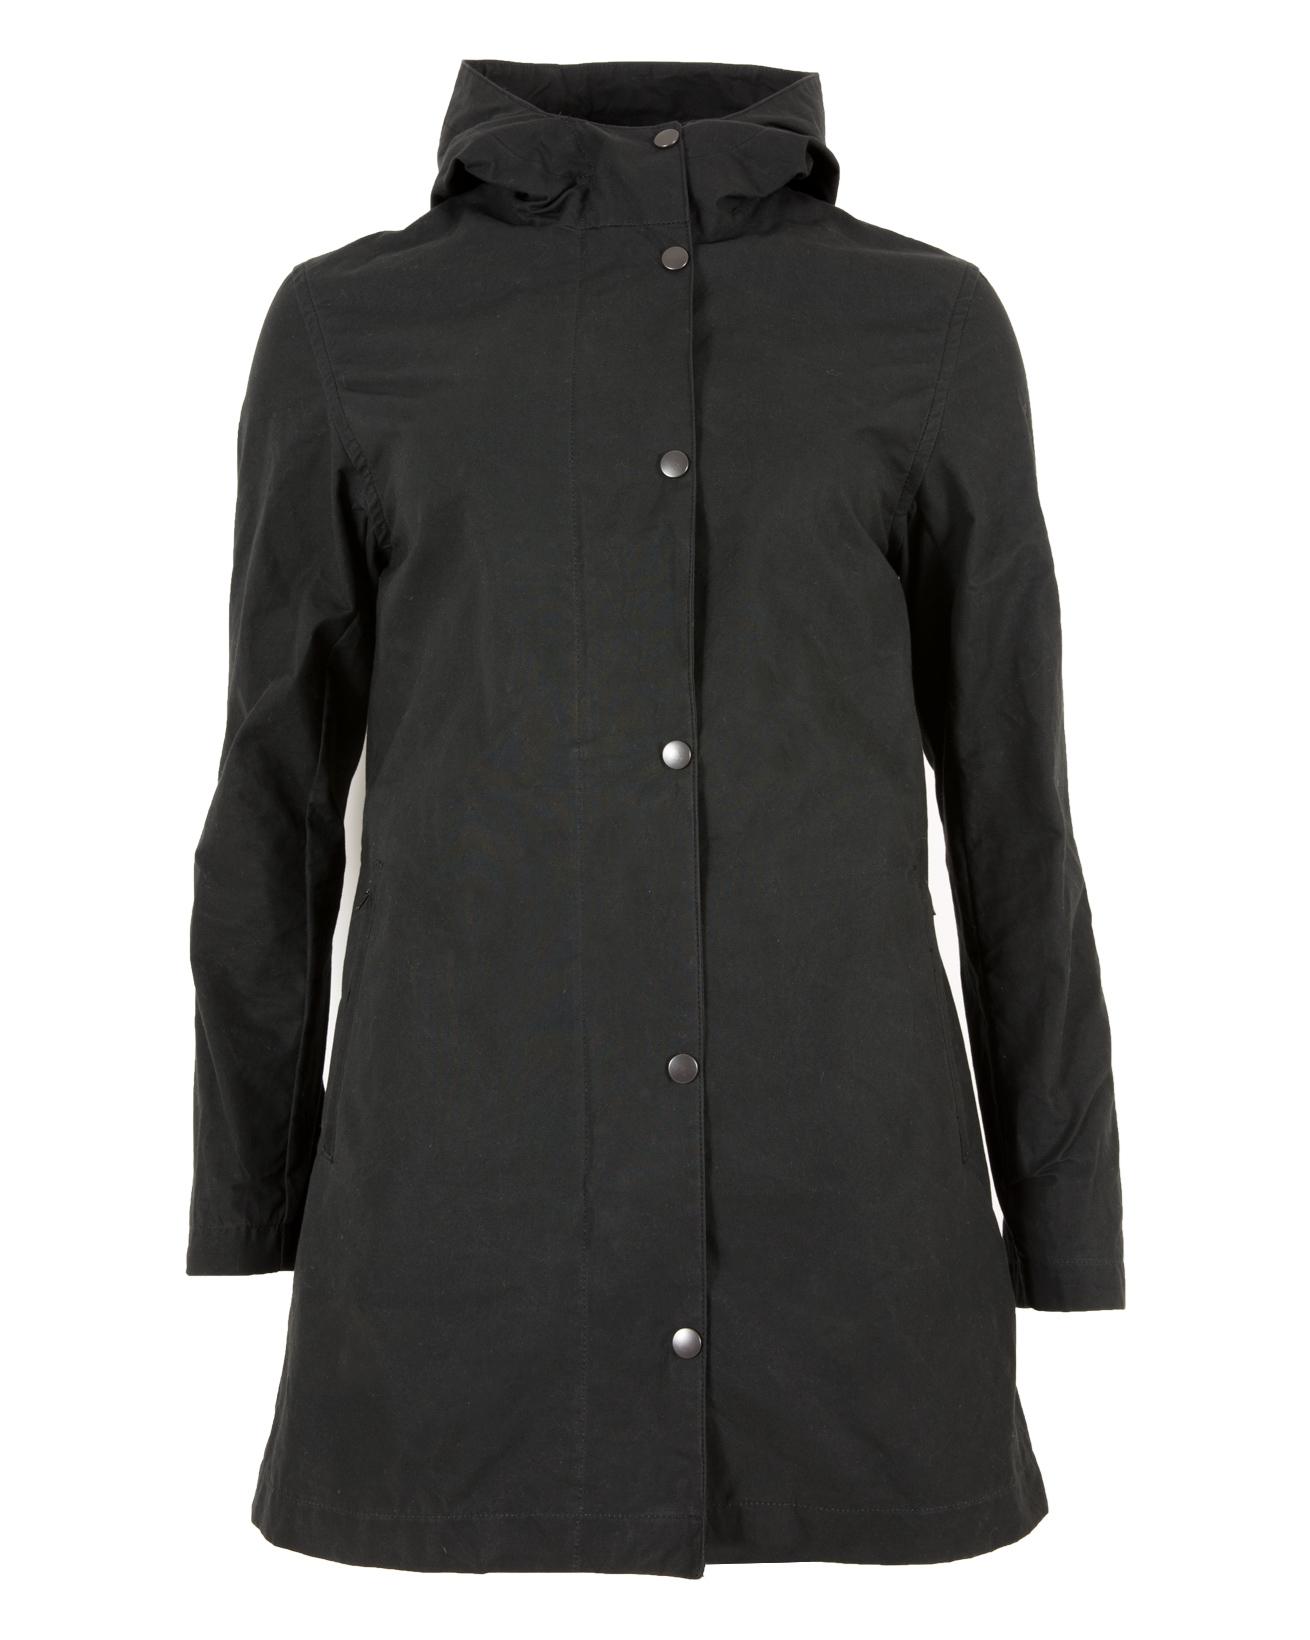 7506-wax rain jacket-black-front.jpg